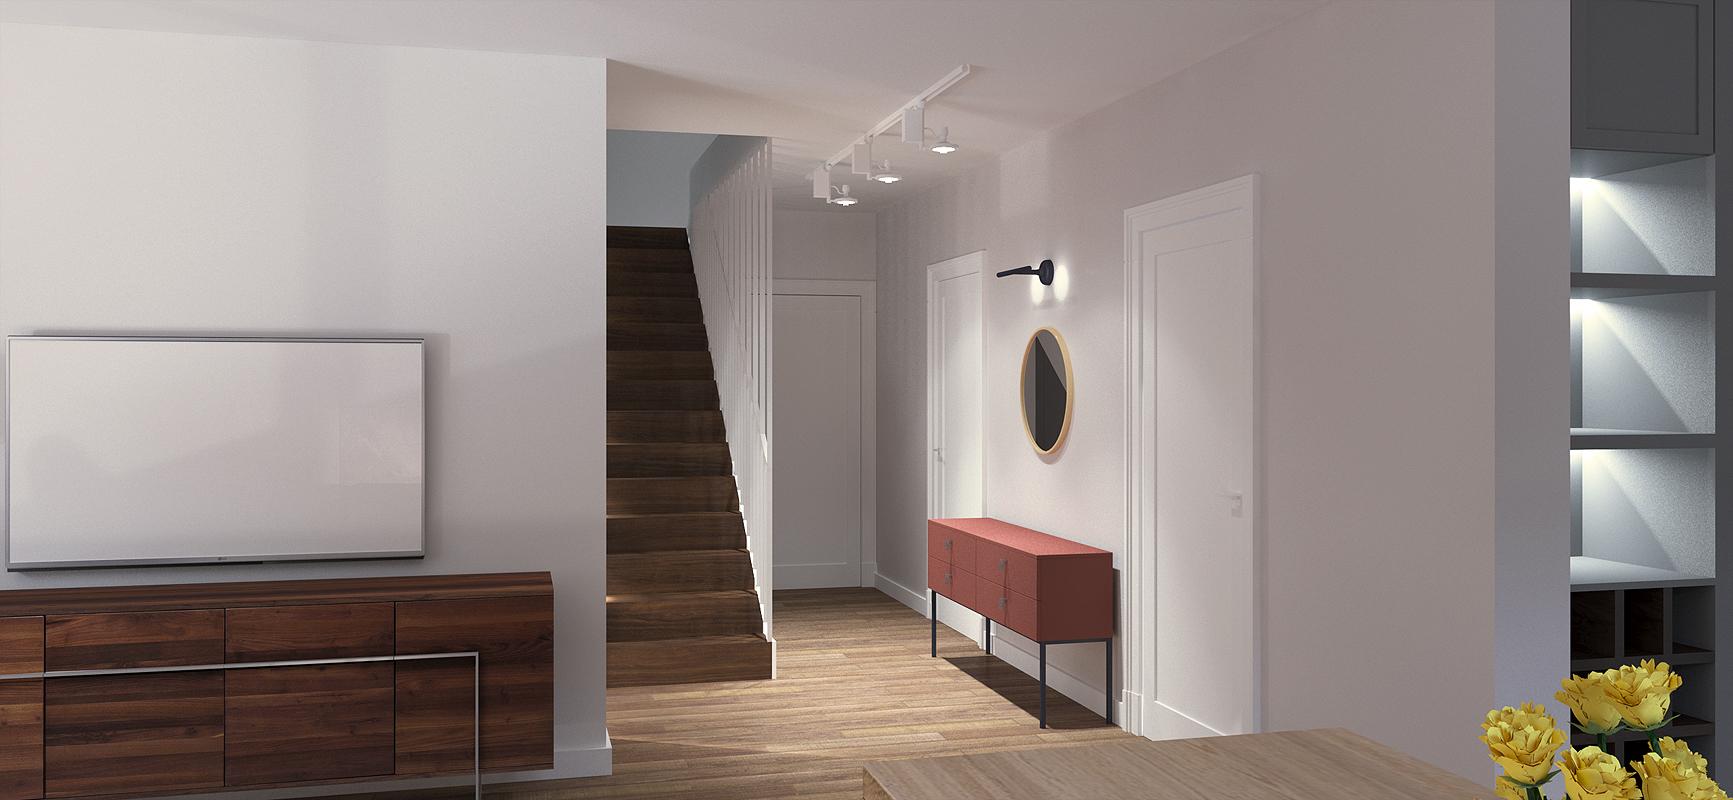 korytarz01